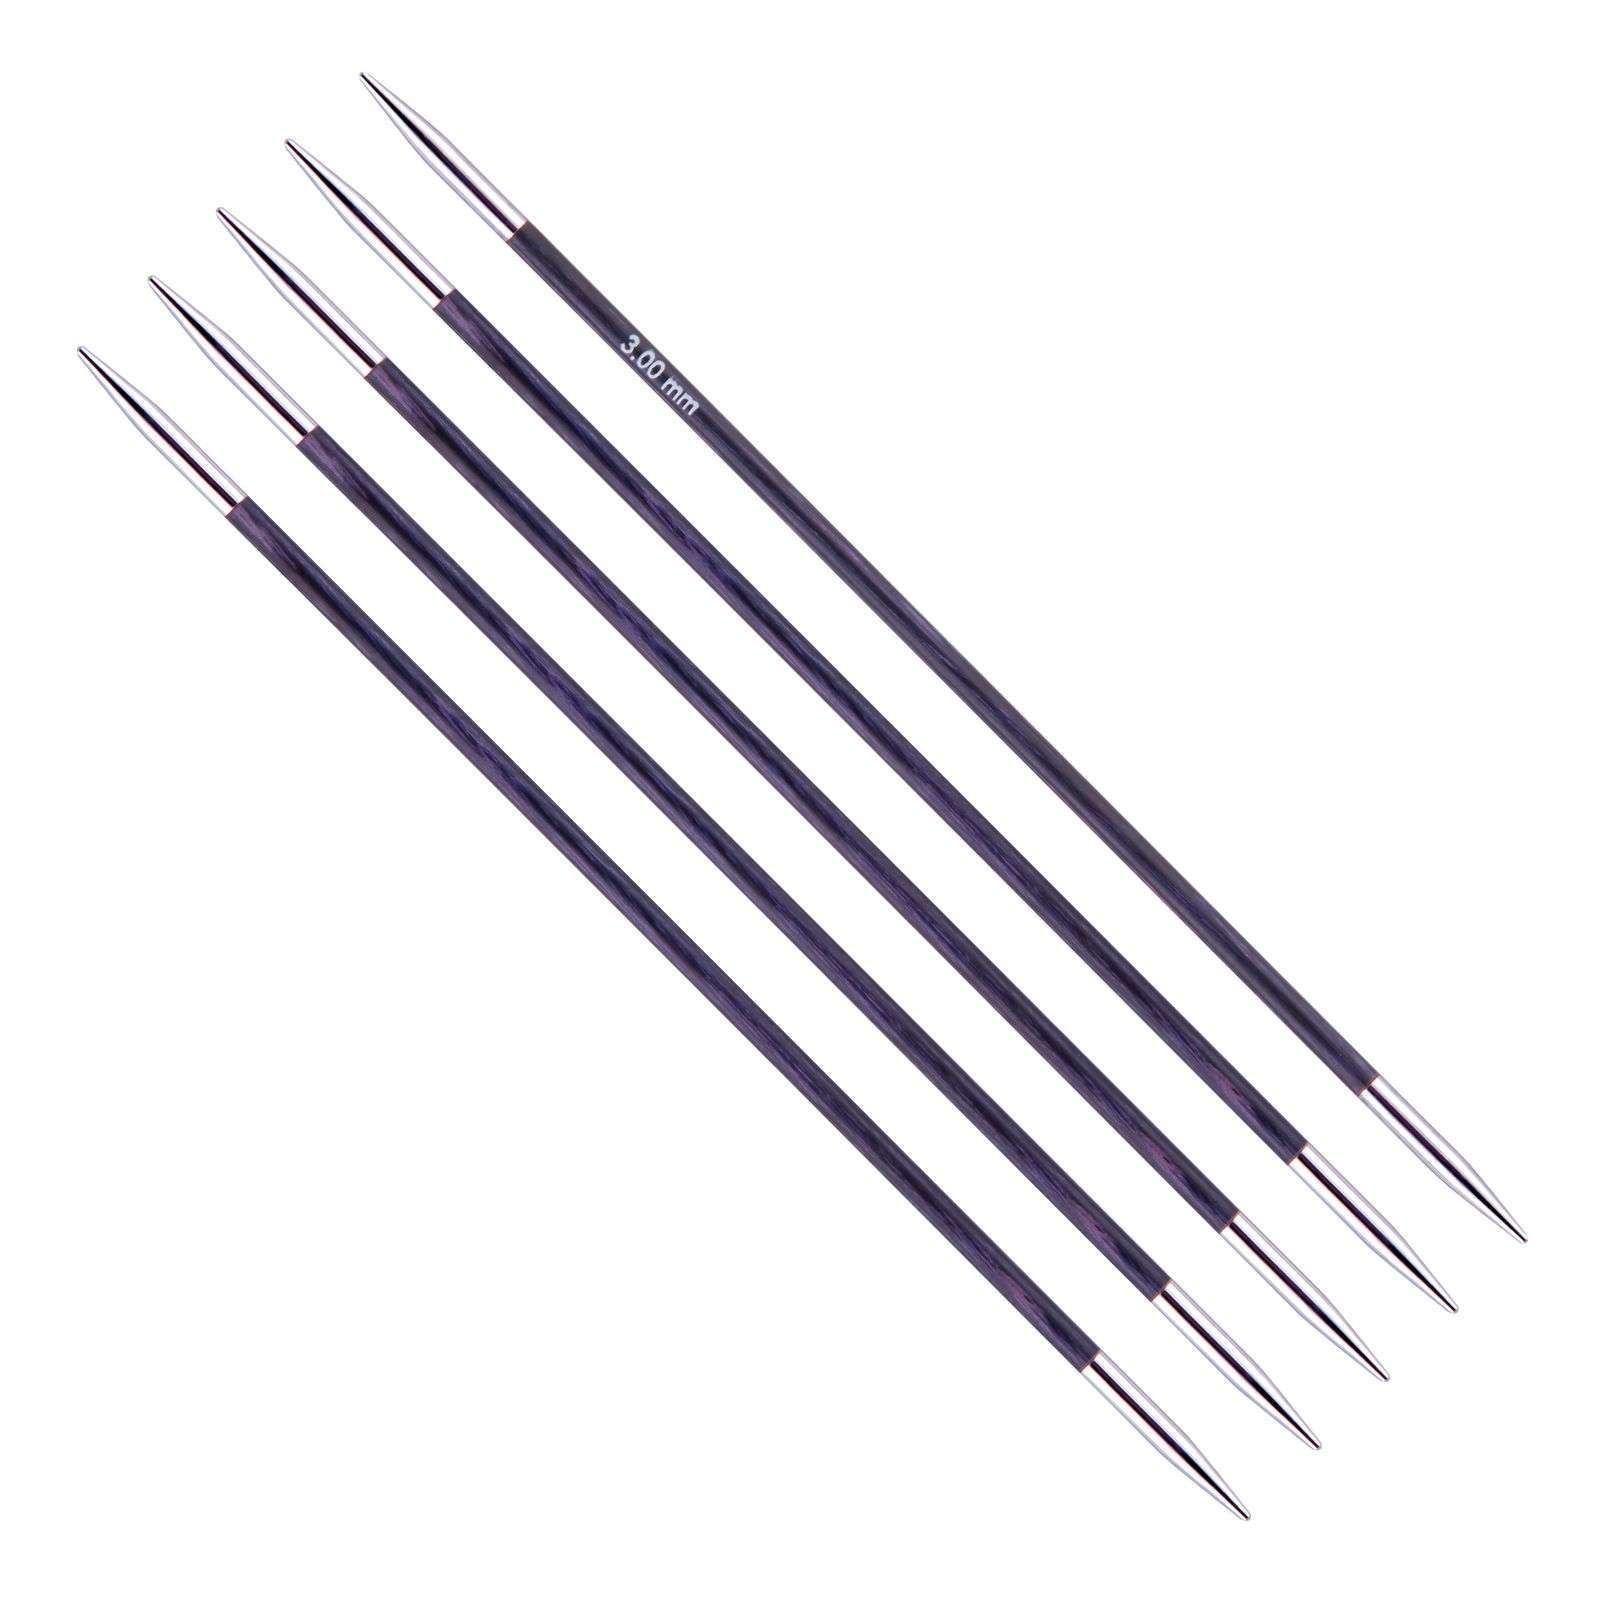 3.25mm BIRCH 20cm length Premium Double Point Knitting Needles